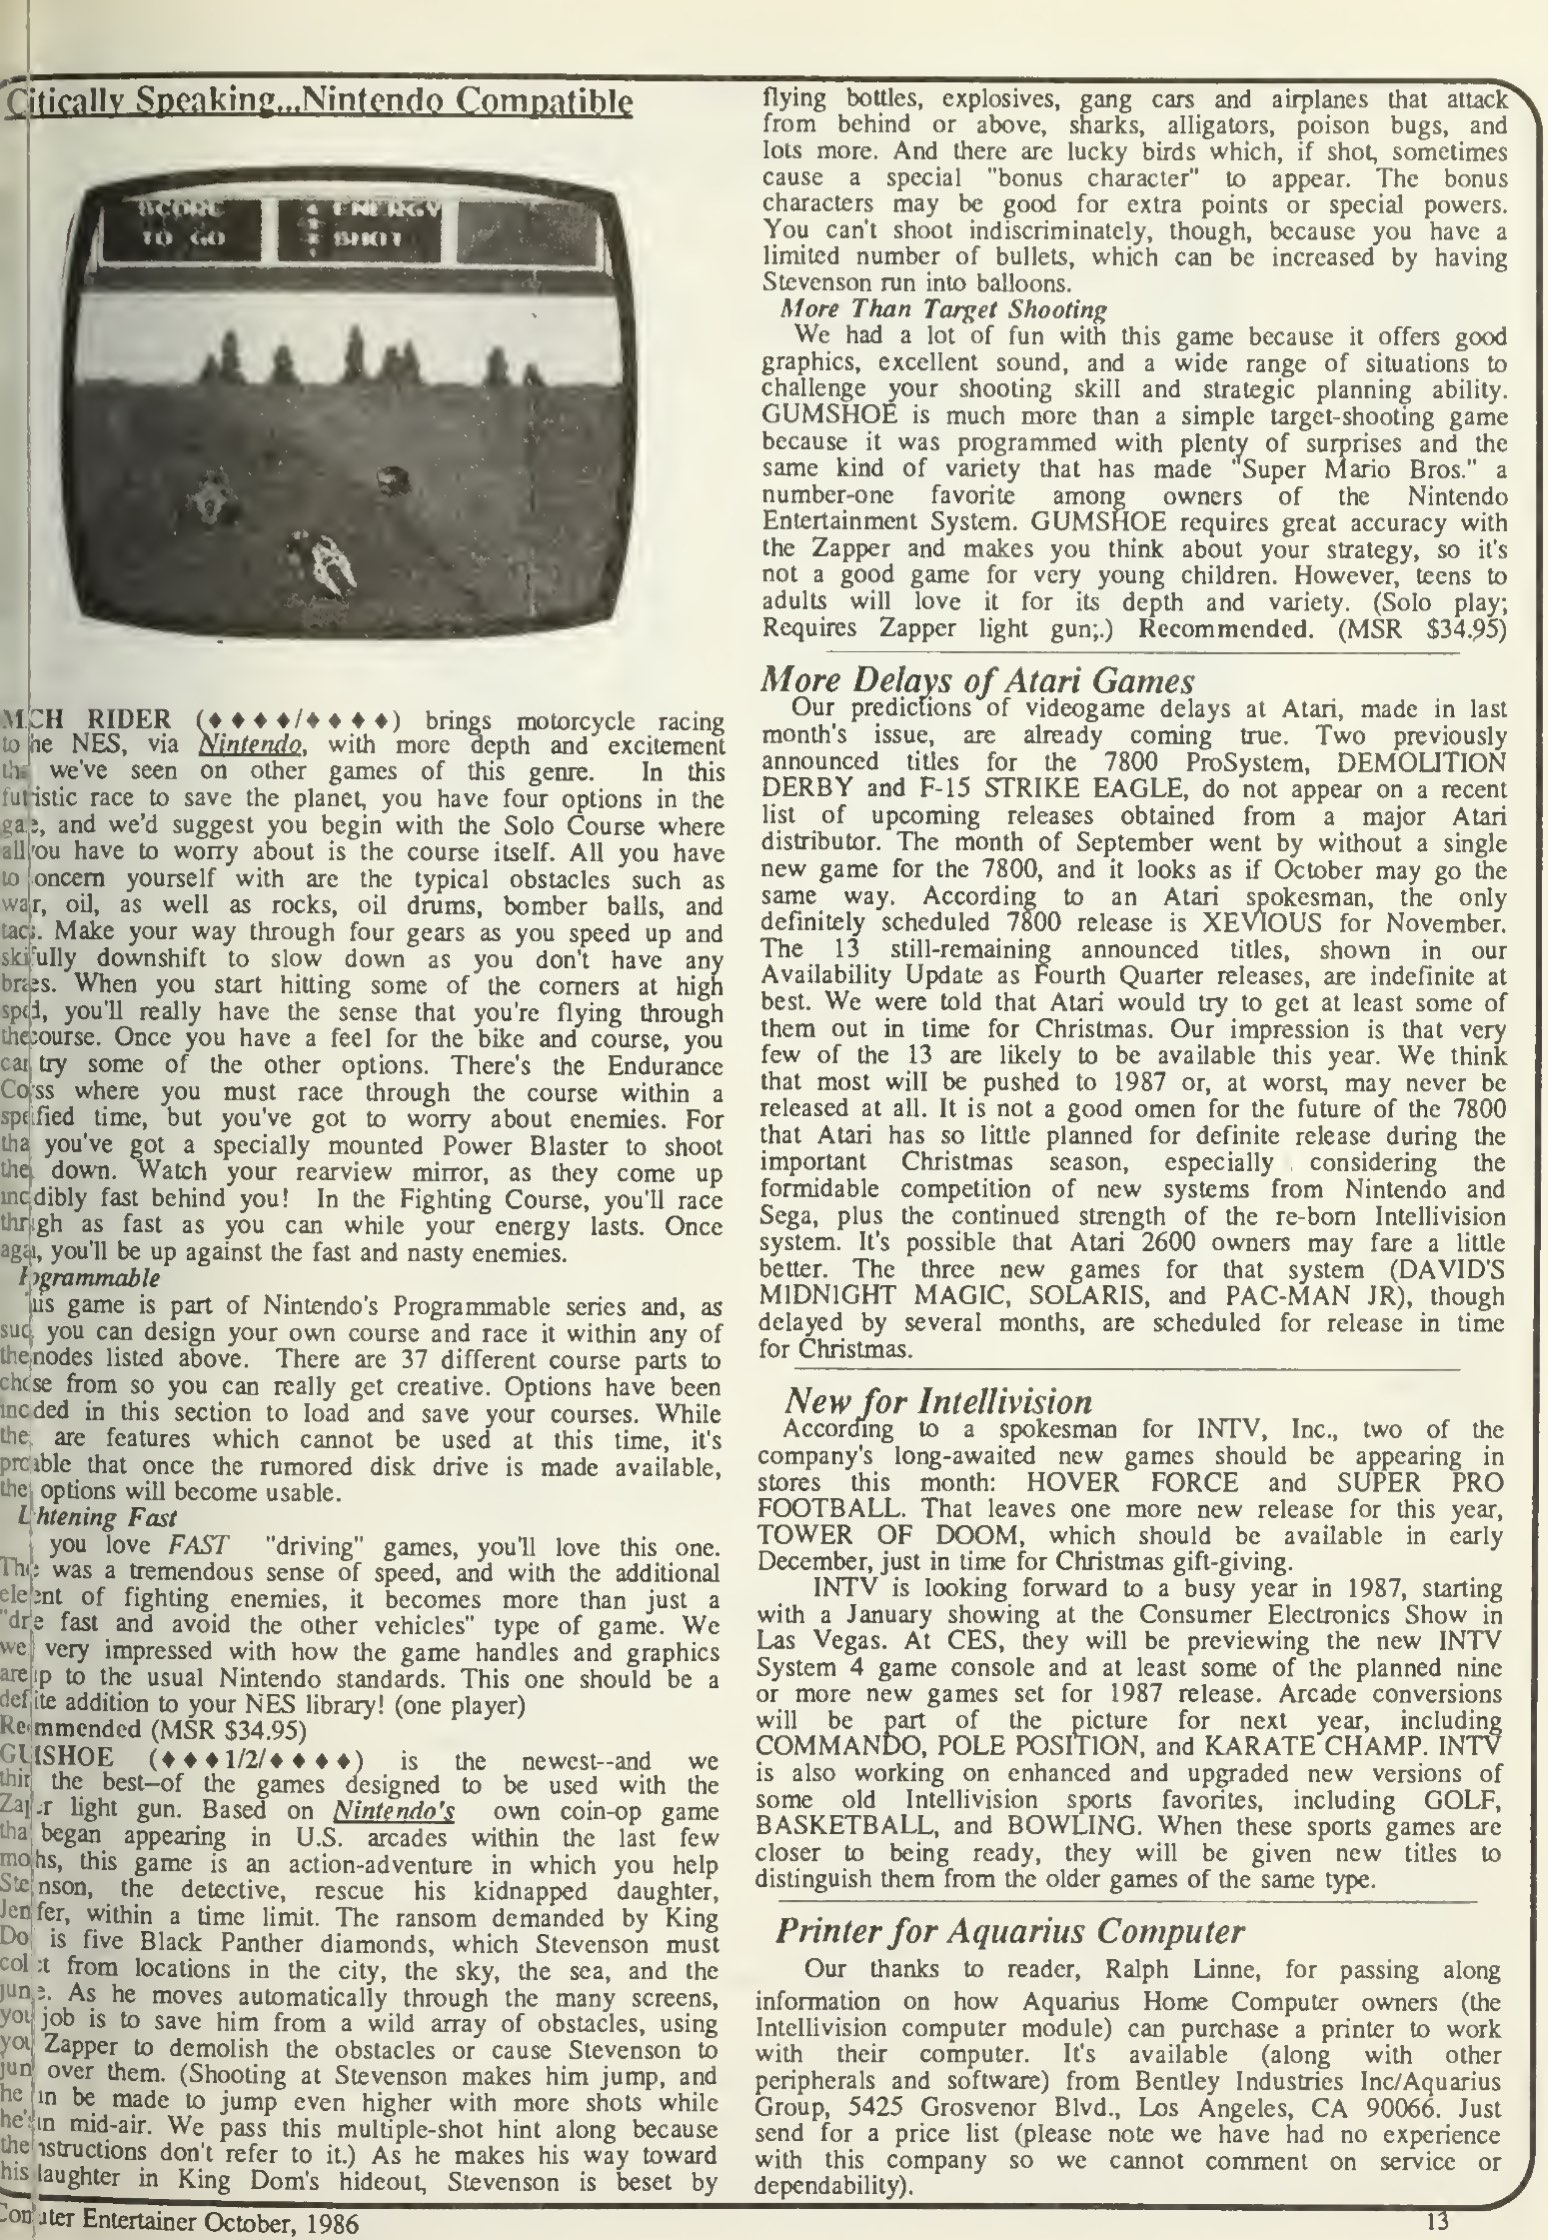 Mach Rider & Gumshoe Reviews - Computer Entertainer - October 1986